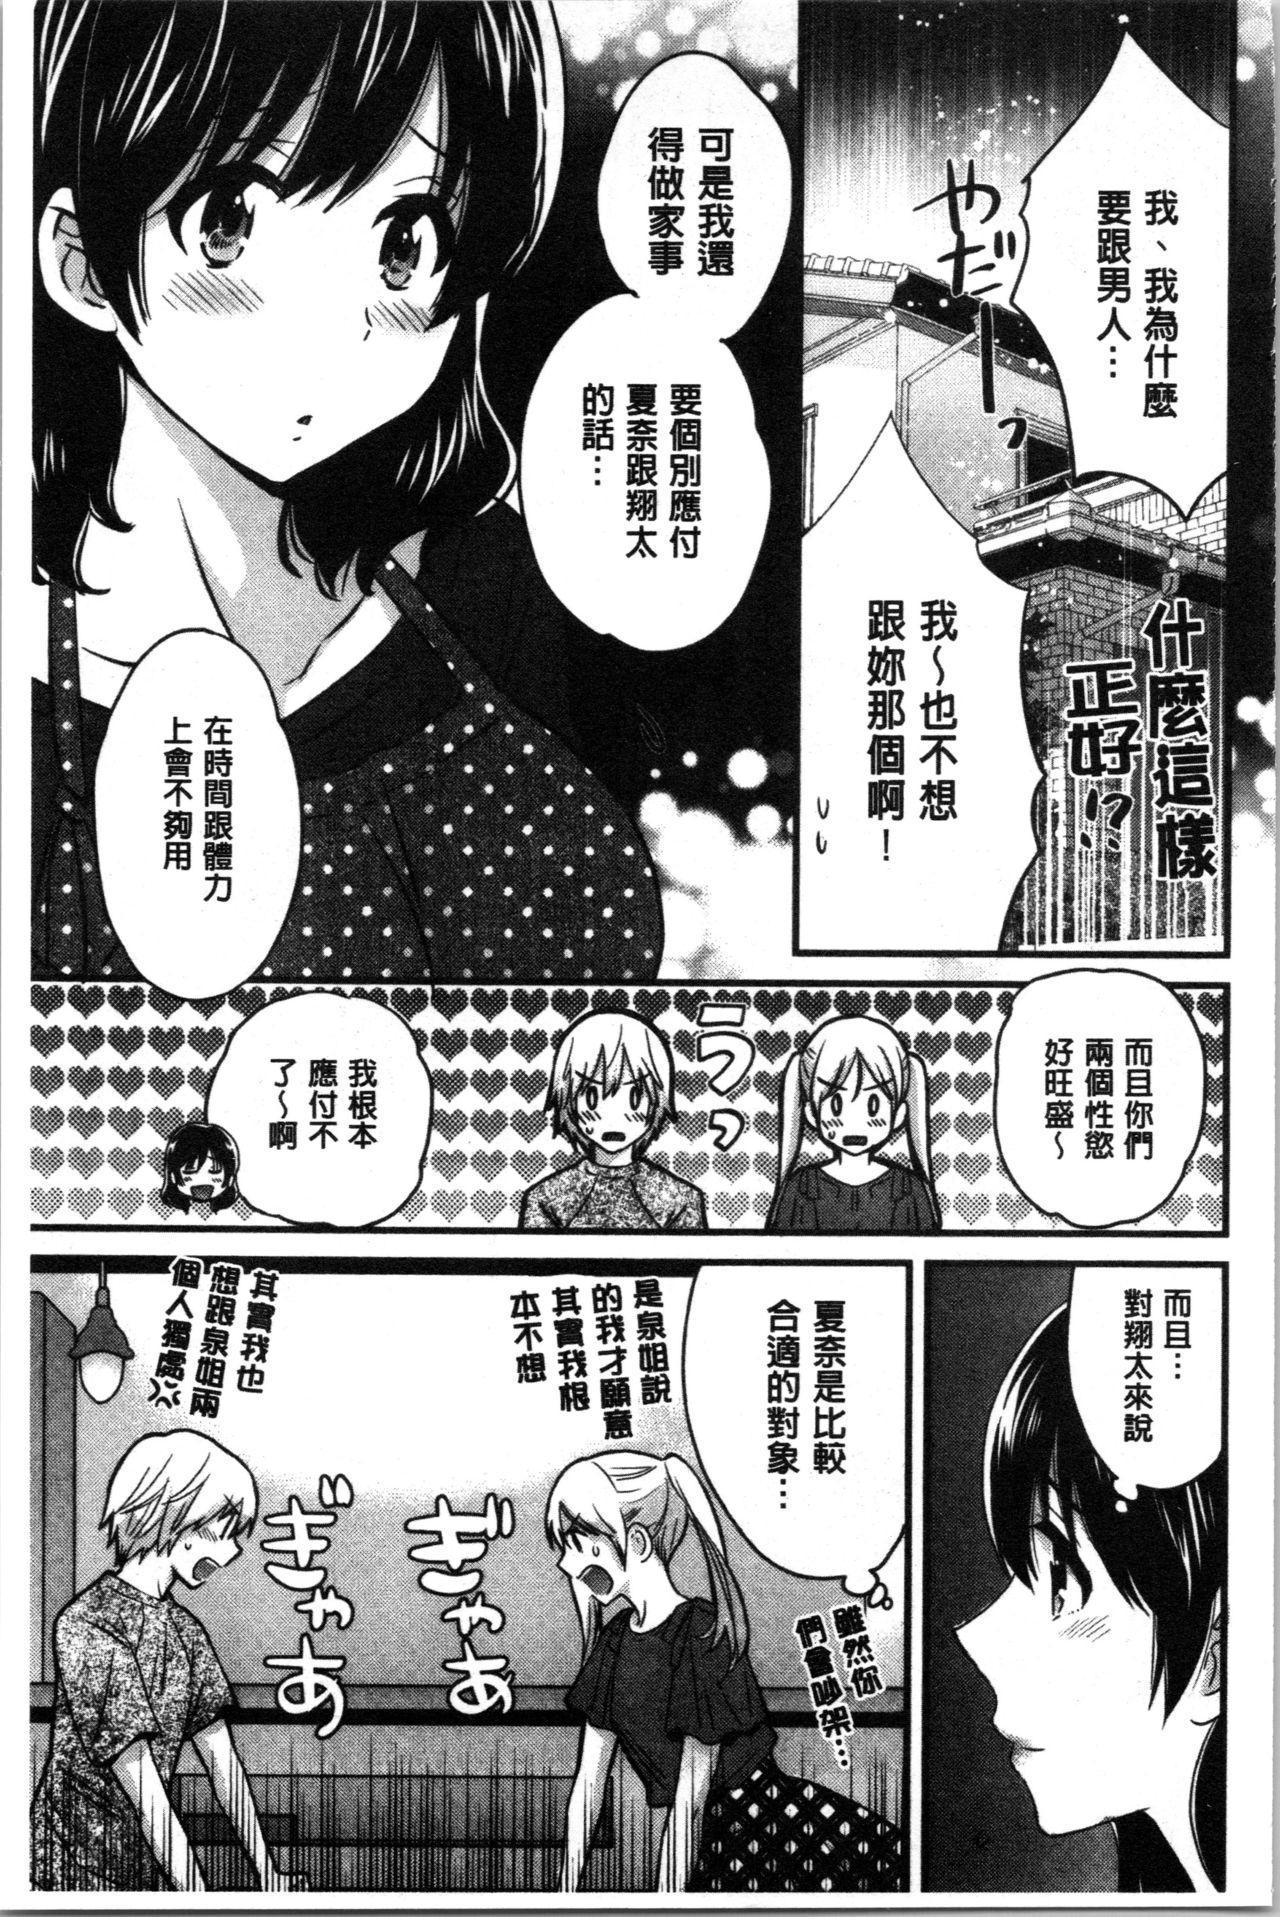 Ottori Midarana Mikami-san   嫻淑優雅又淫亂的三上小姐 71